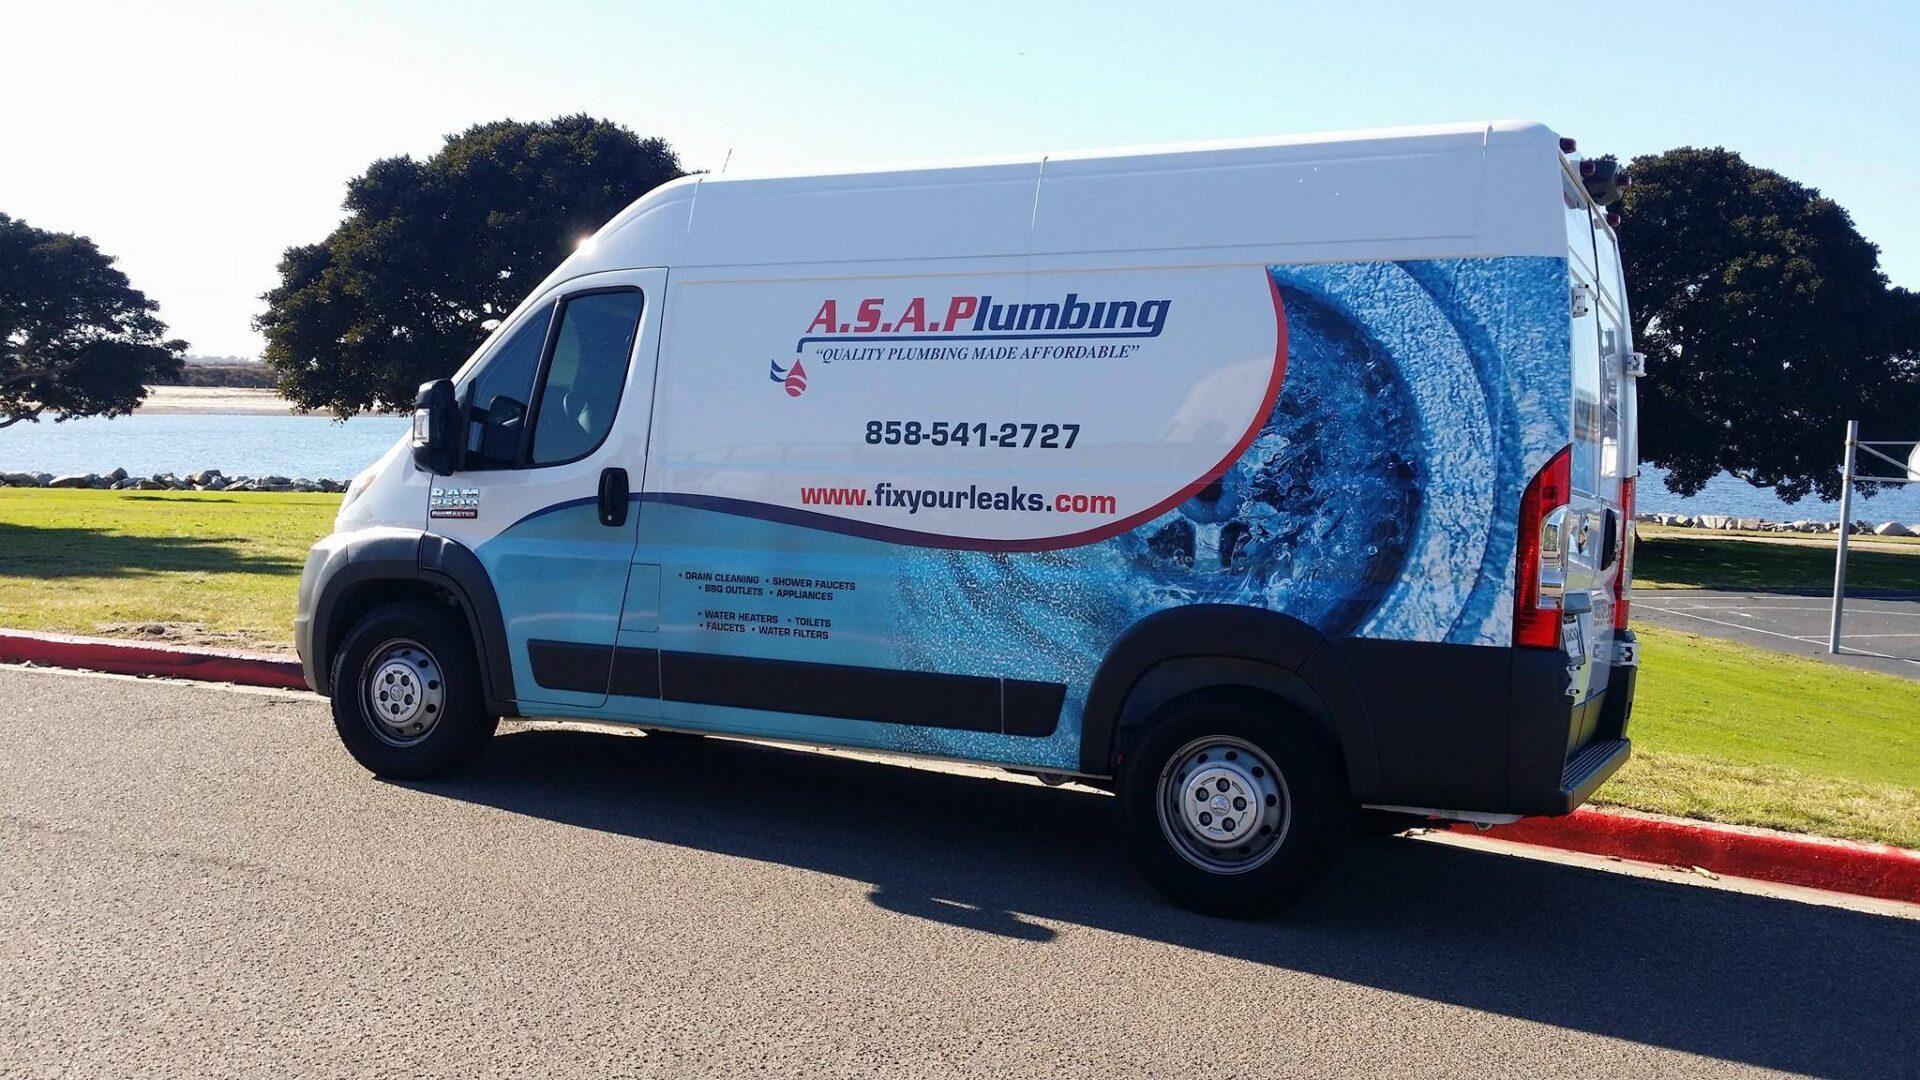 A.S.A.P.Plumbing